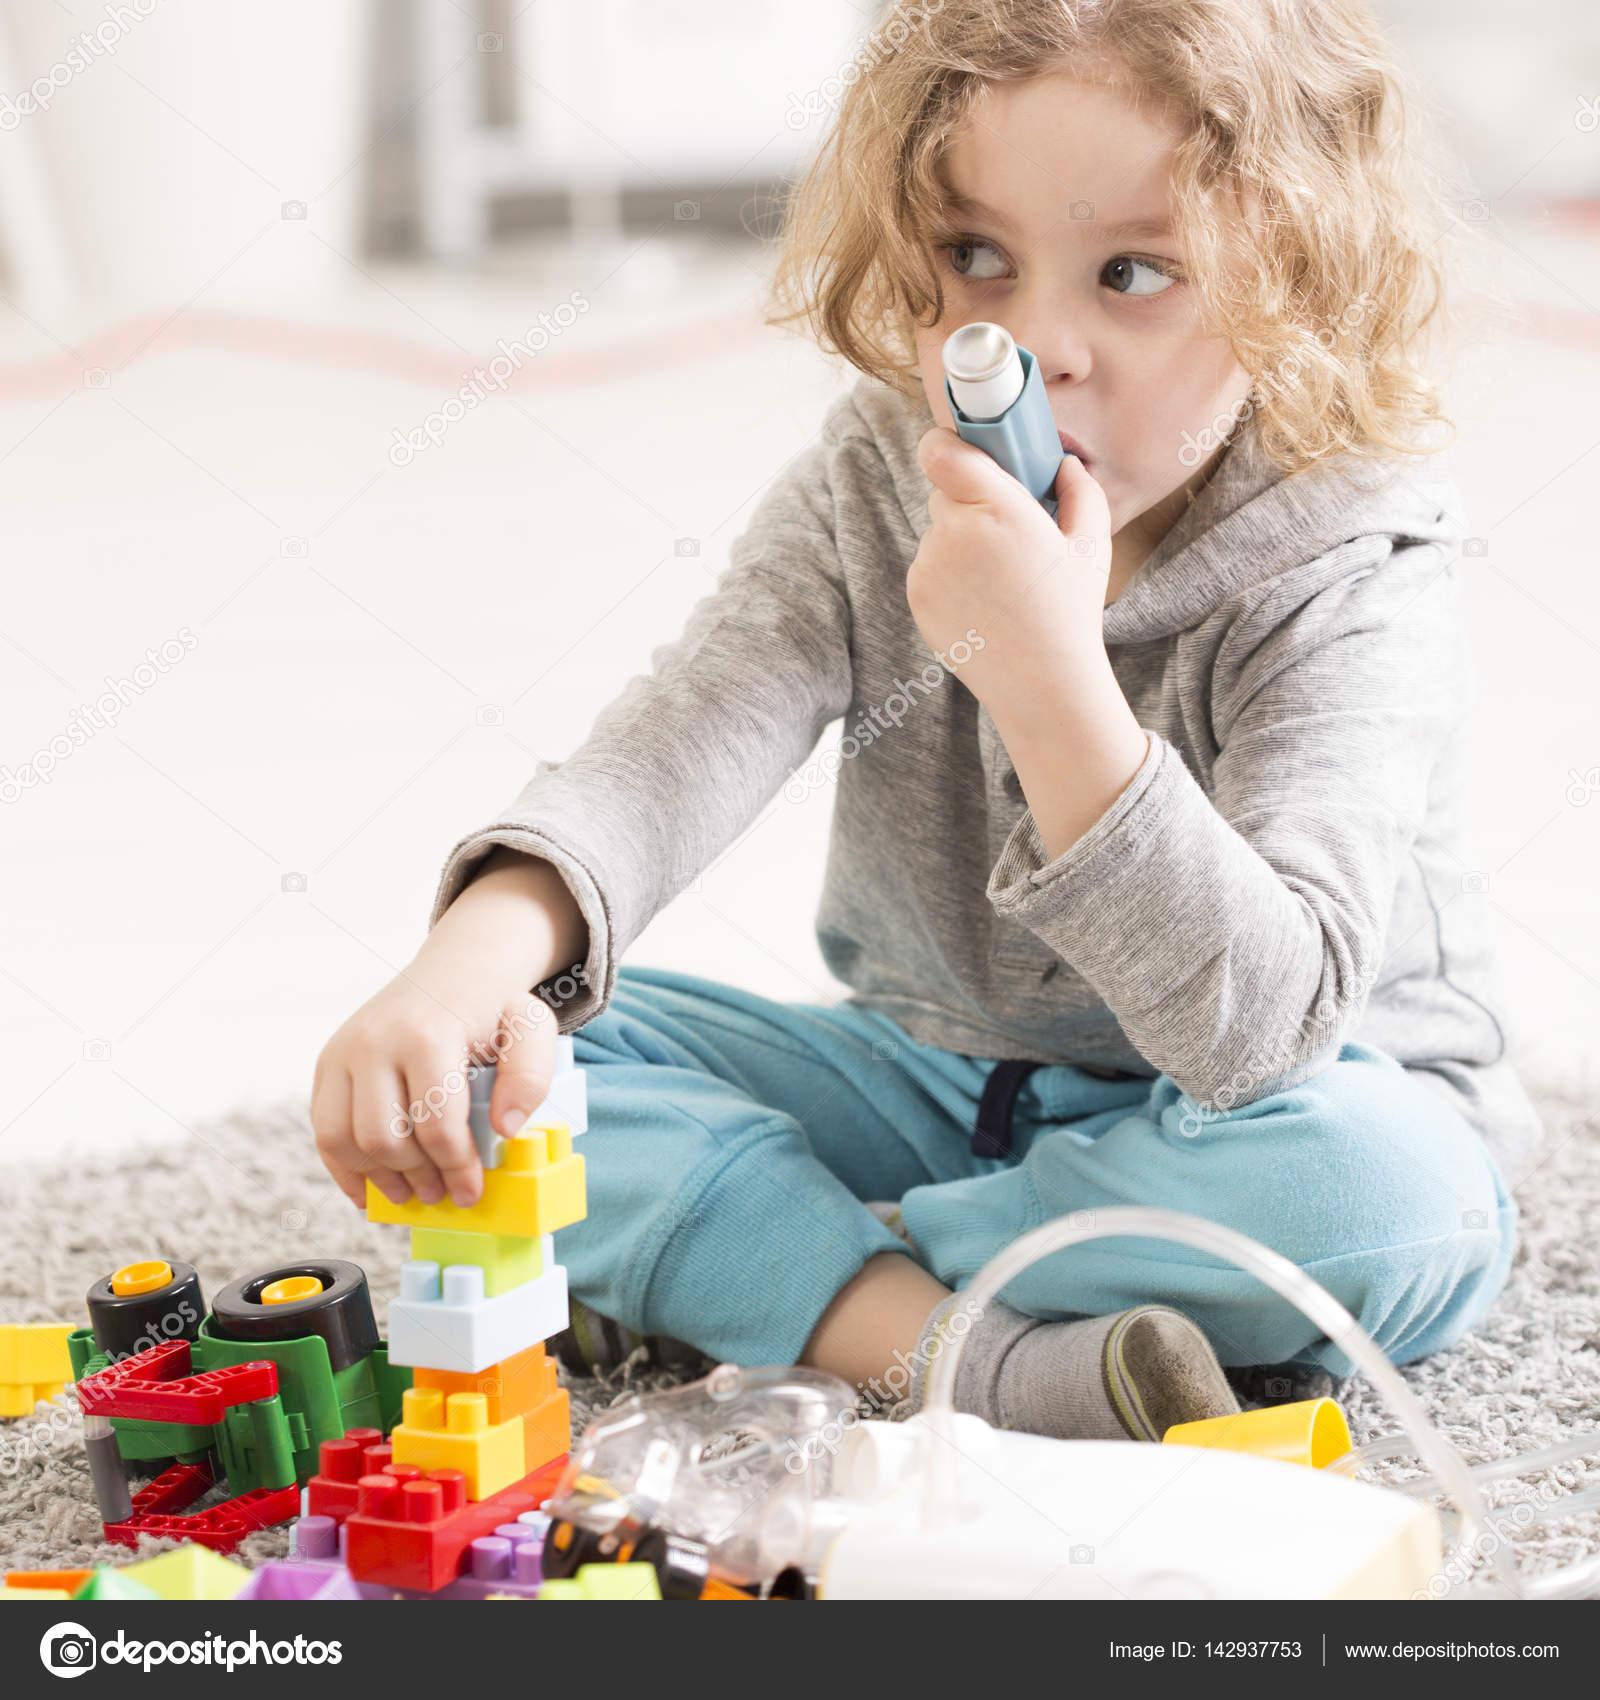 Pediatric Pneumonia Treatment At Home Stock Photo